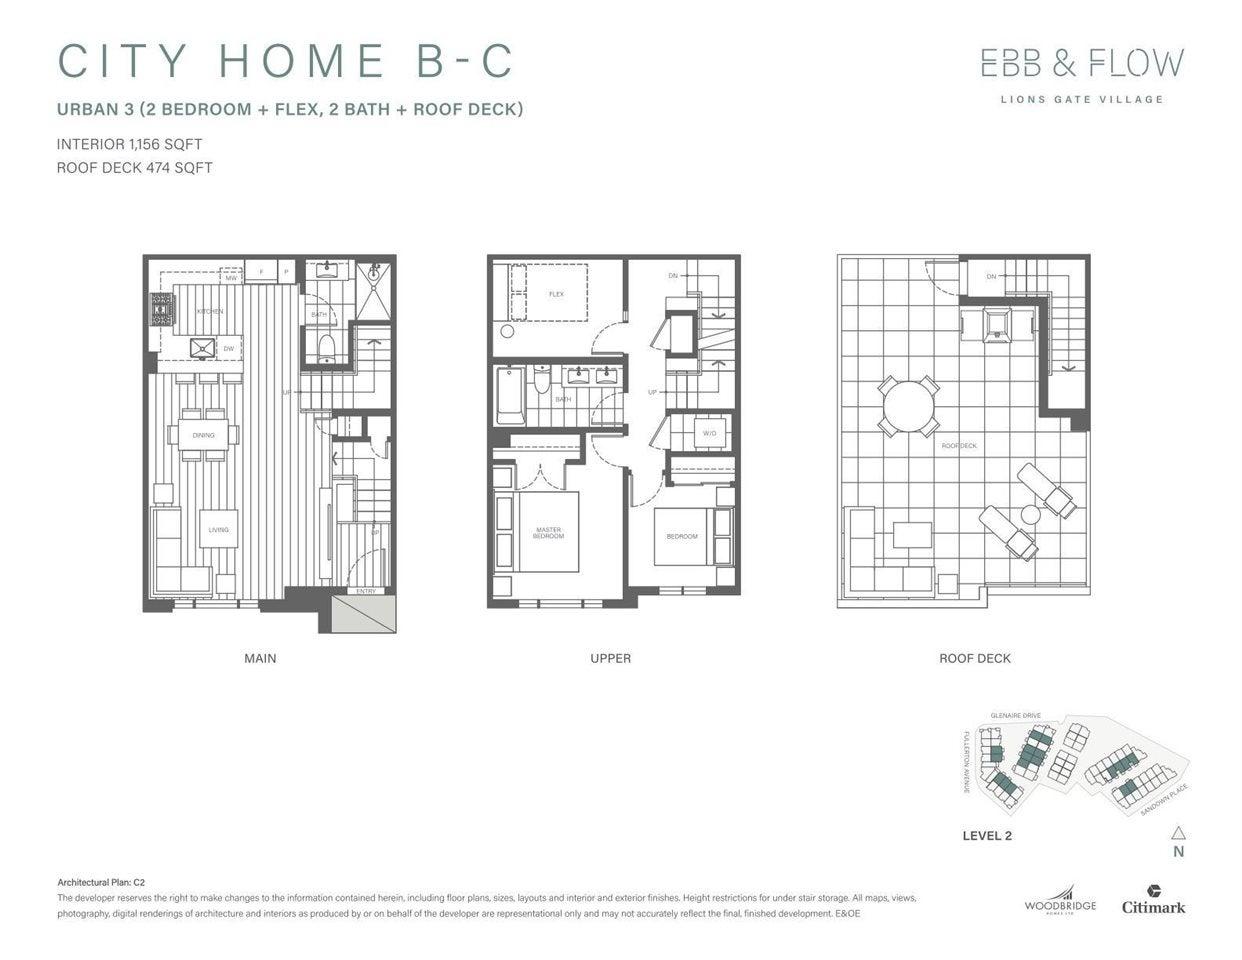 229 2035 GLENAIRE DRIVE - Pemberton NV Townhouse for sale, 2 Bedrooms (R2590964) - #11